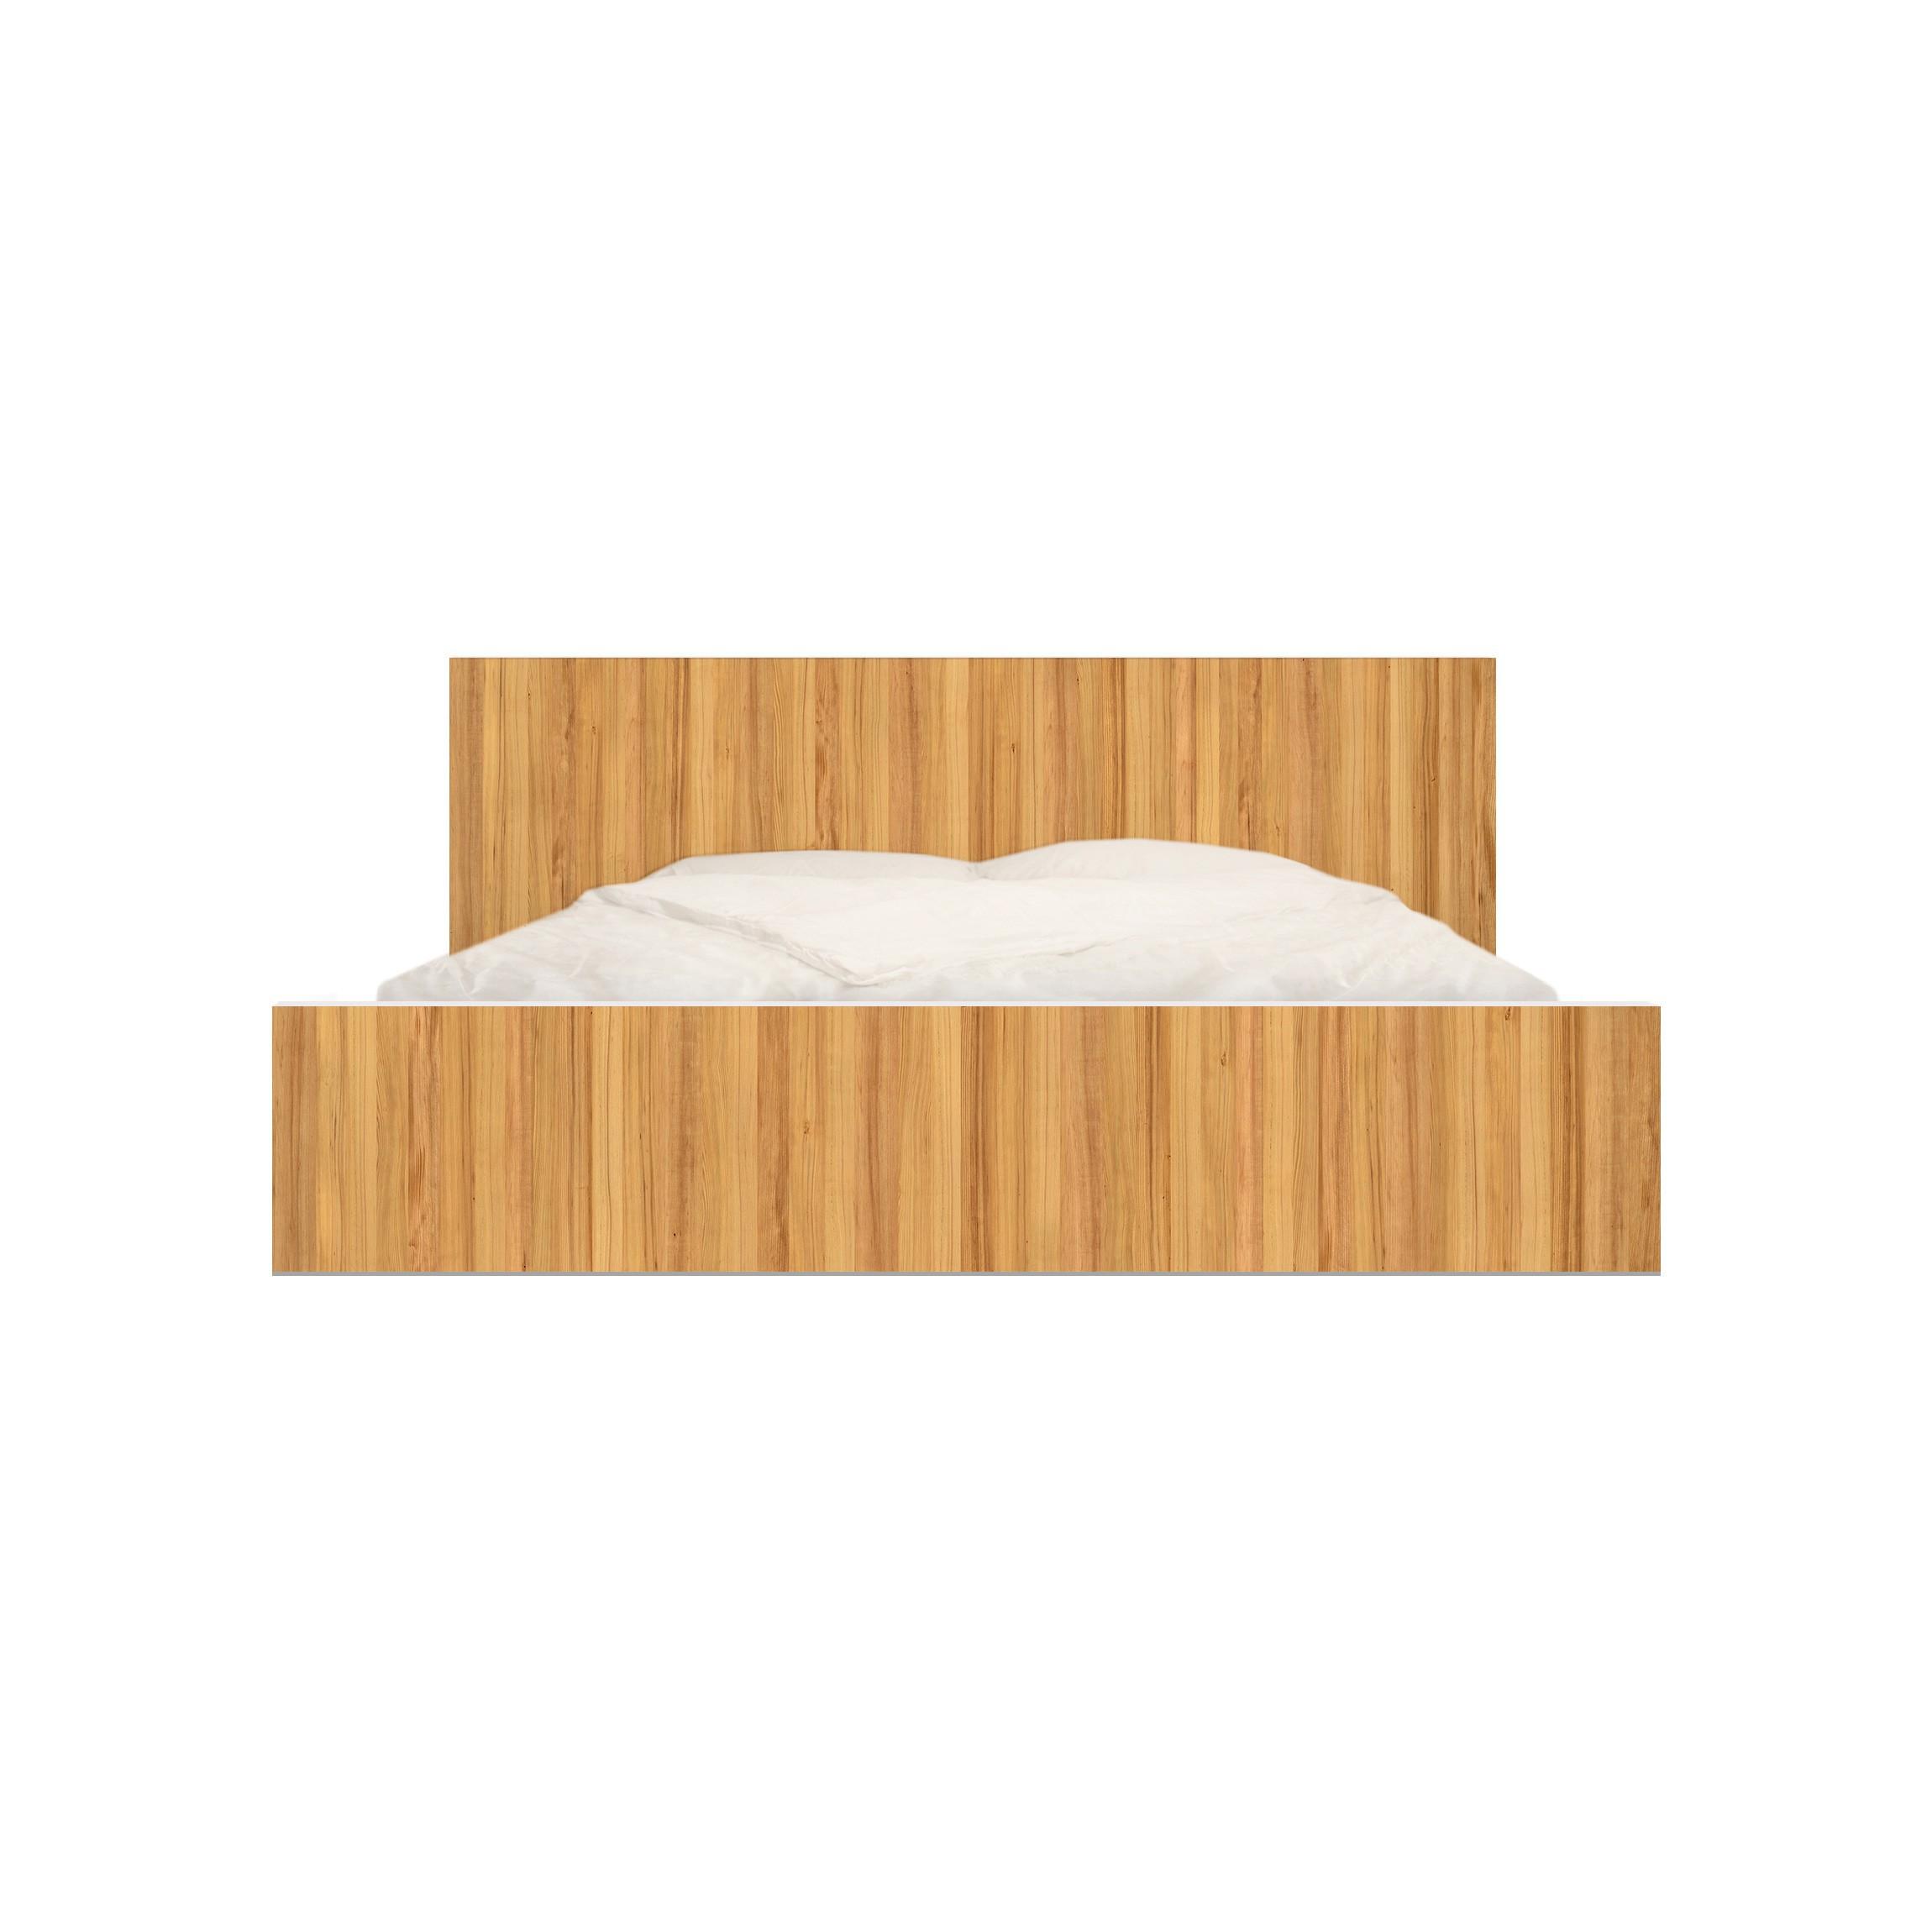 m belfolie f r ikea malm bett niedrig 140x200cm klebefolie wei tanne. Black Bedroom Furniture Sets. Home Design Ideas